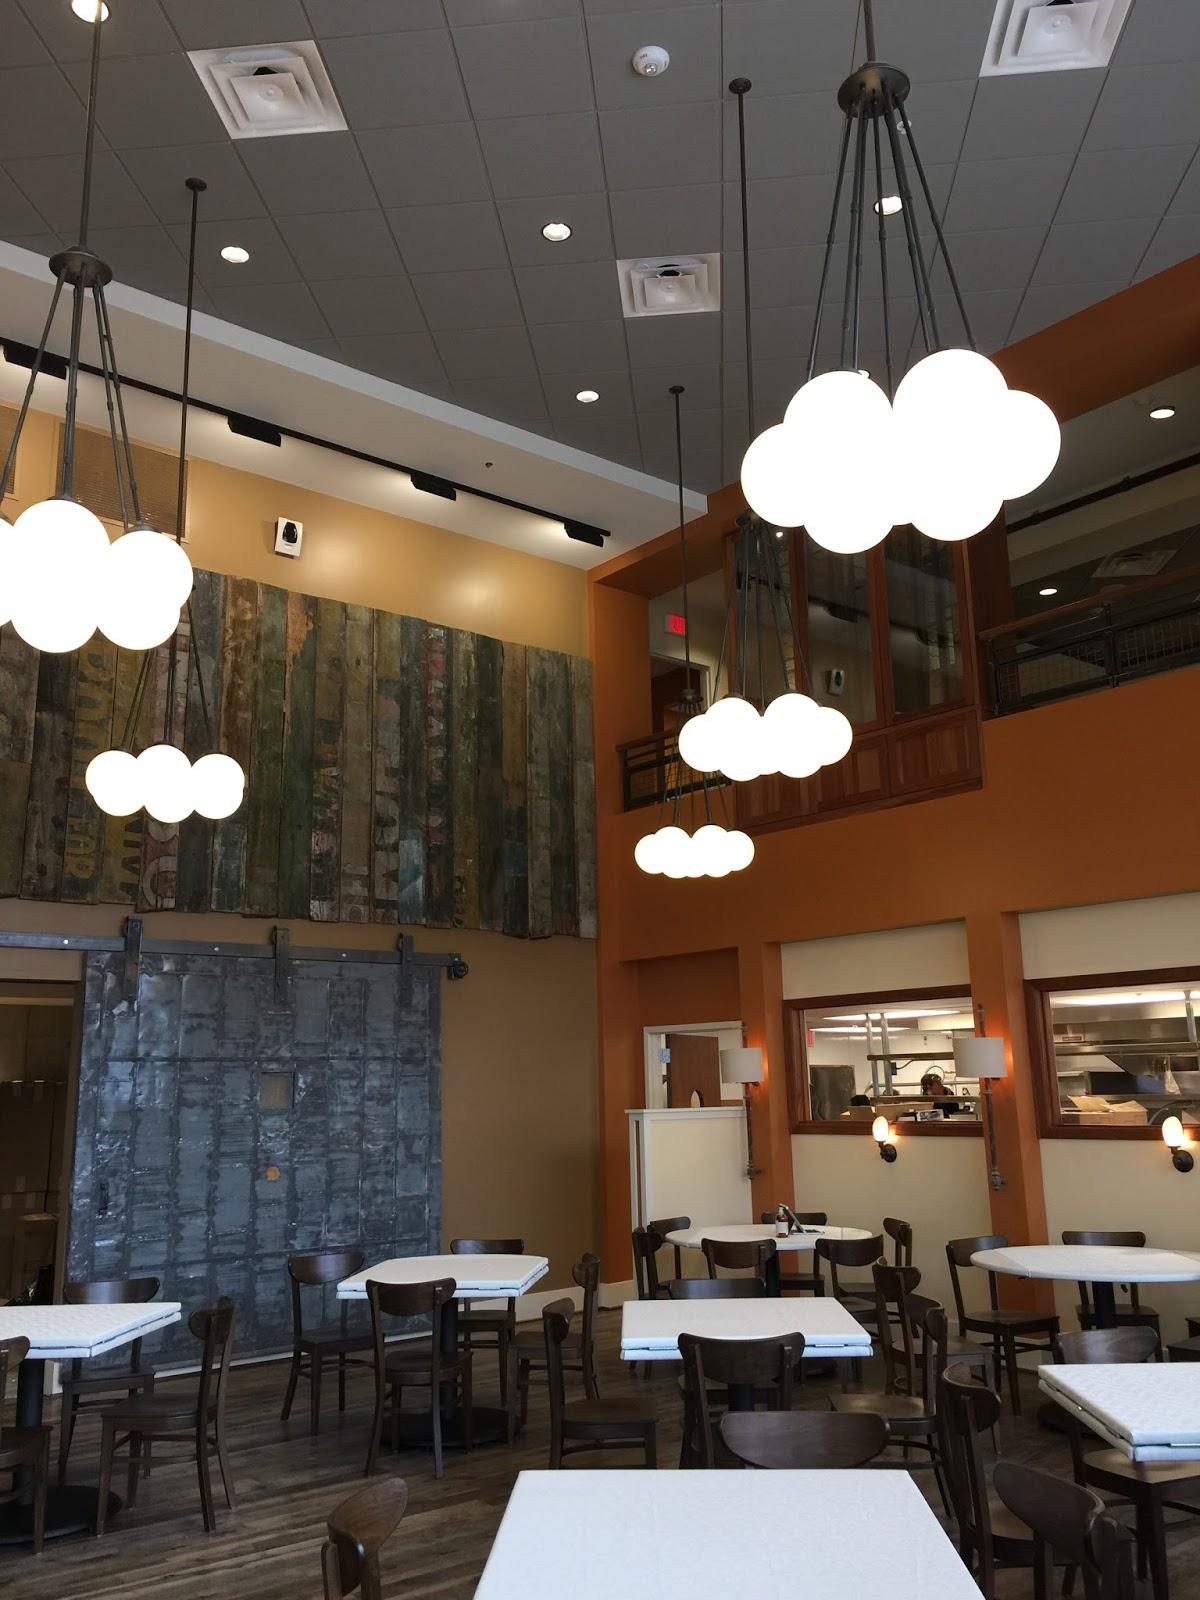 Nanasteak New Steakhouse Opens Next to DPAC